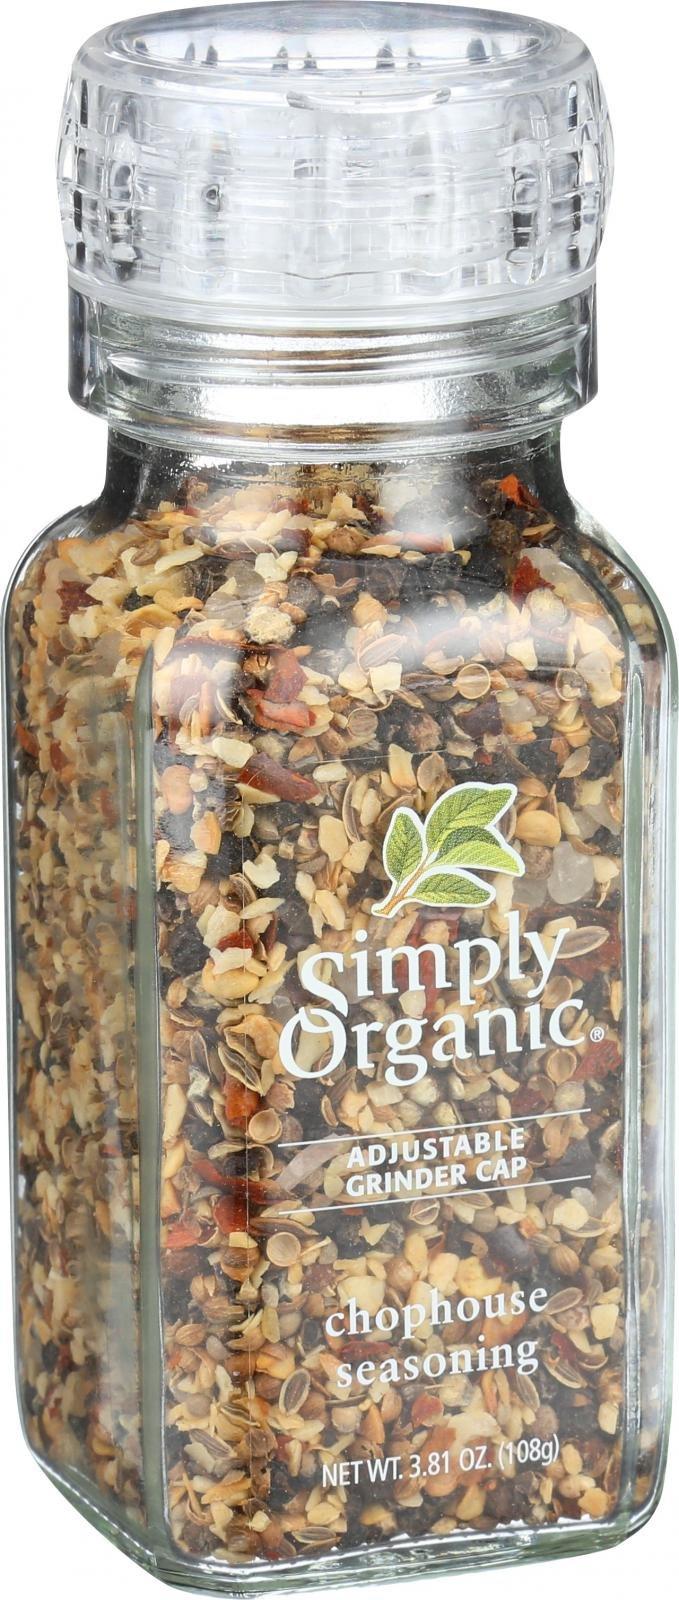 Simply Organic Chophouse Seasoning - Organic - Grinder - 3.81 oz - 95%+ Organic - Kosher